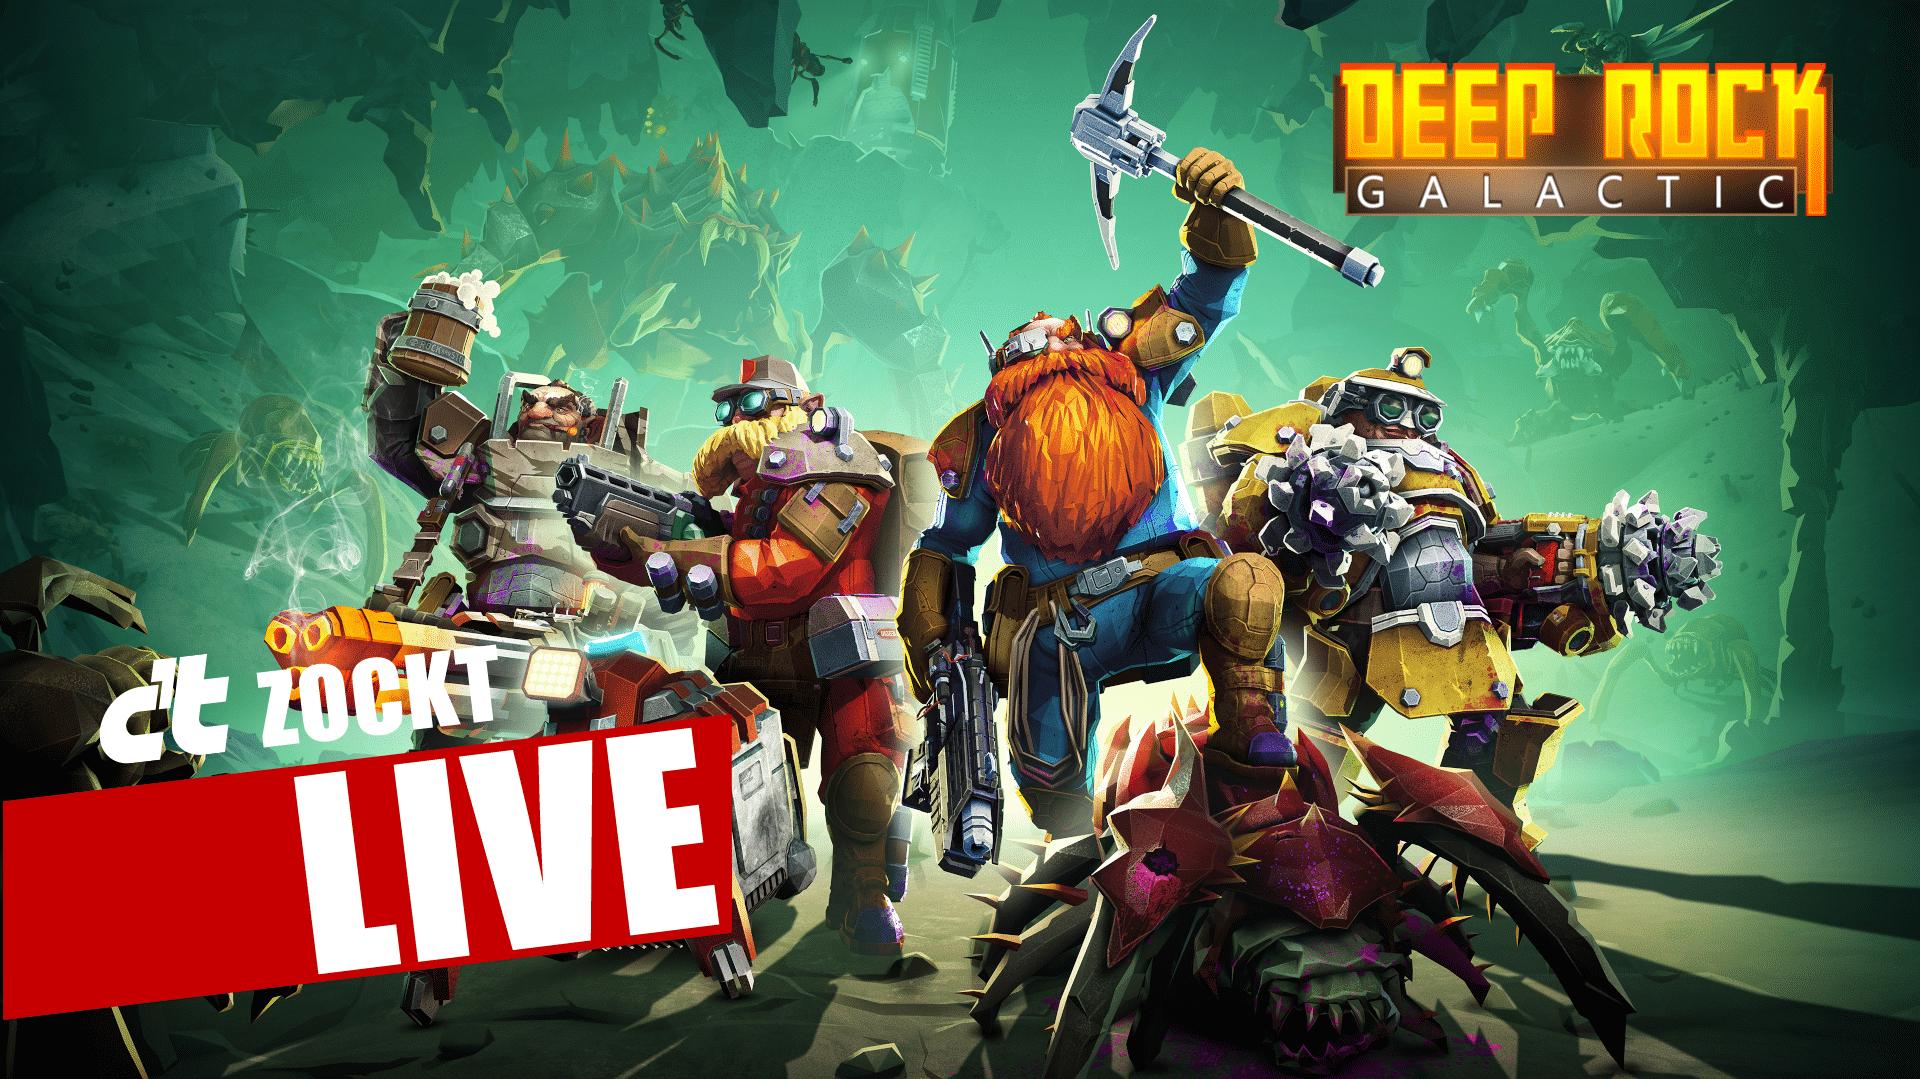 c't zockt LIVE: Deep Rock Galactic - Zwielicht, Zoff, Zwerge